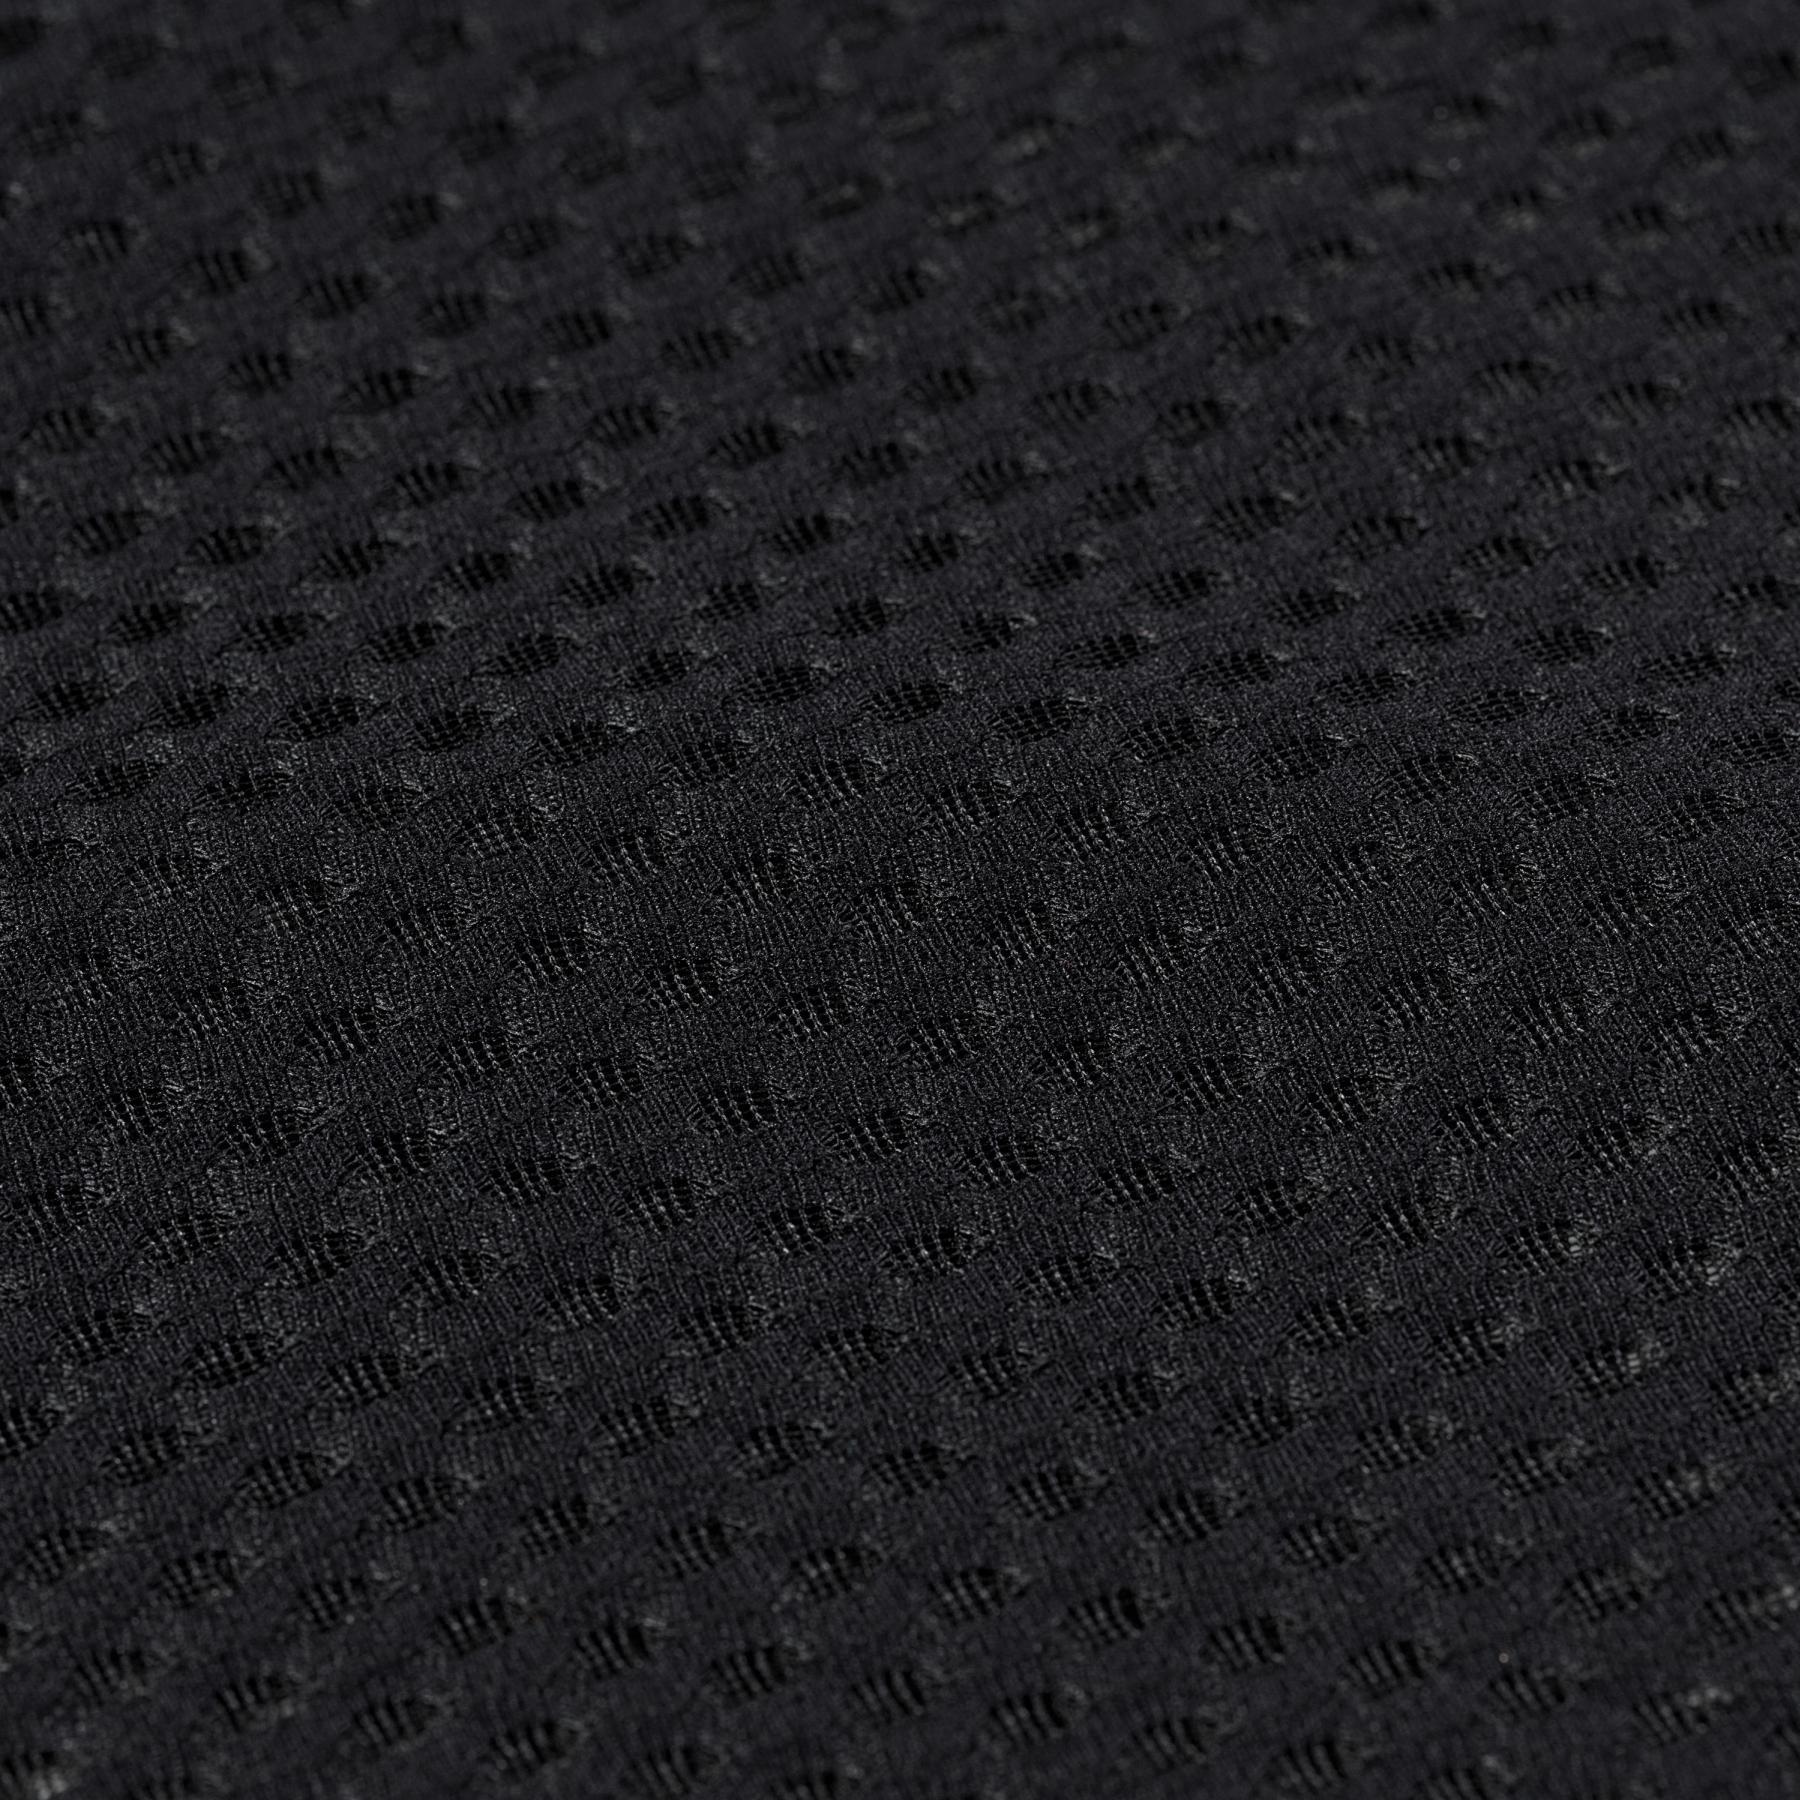 Image of GripGrab Ultralight Sleeveless Mesh Baselayer - Black